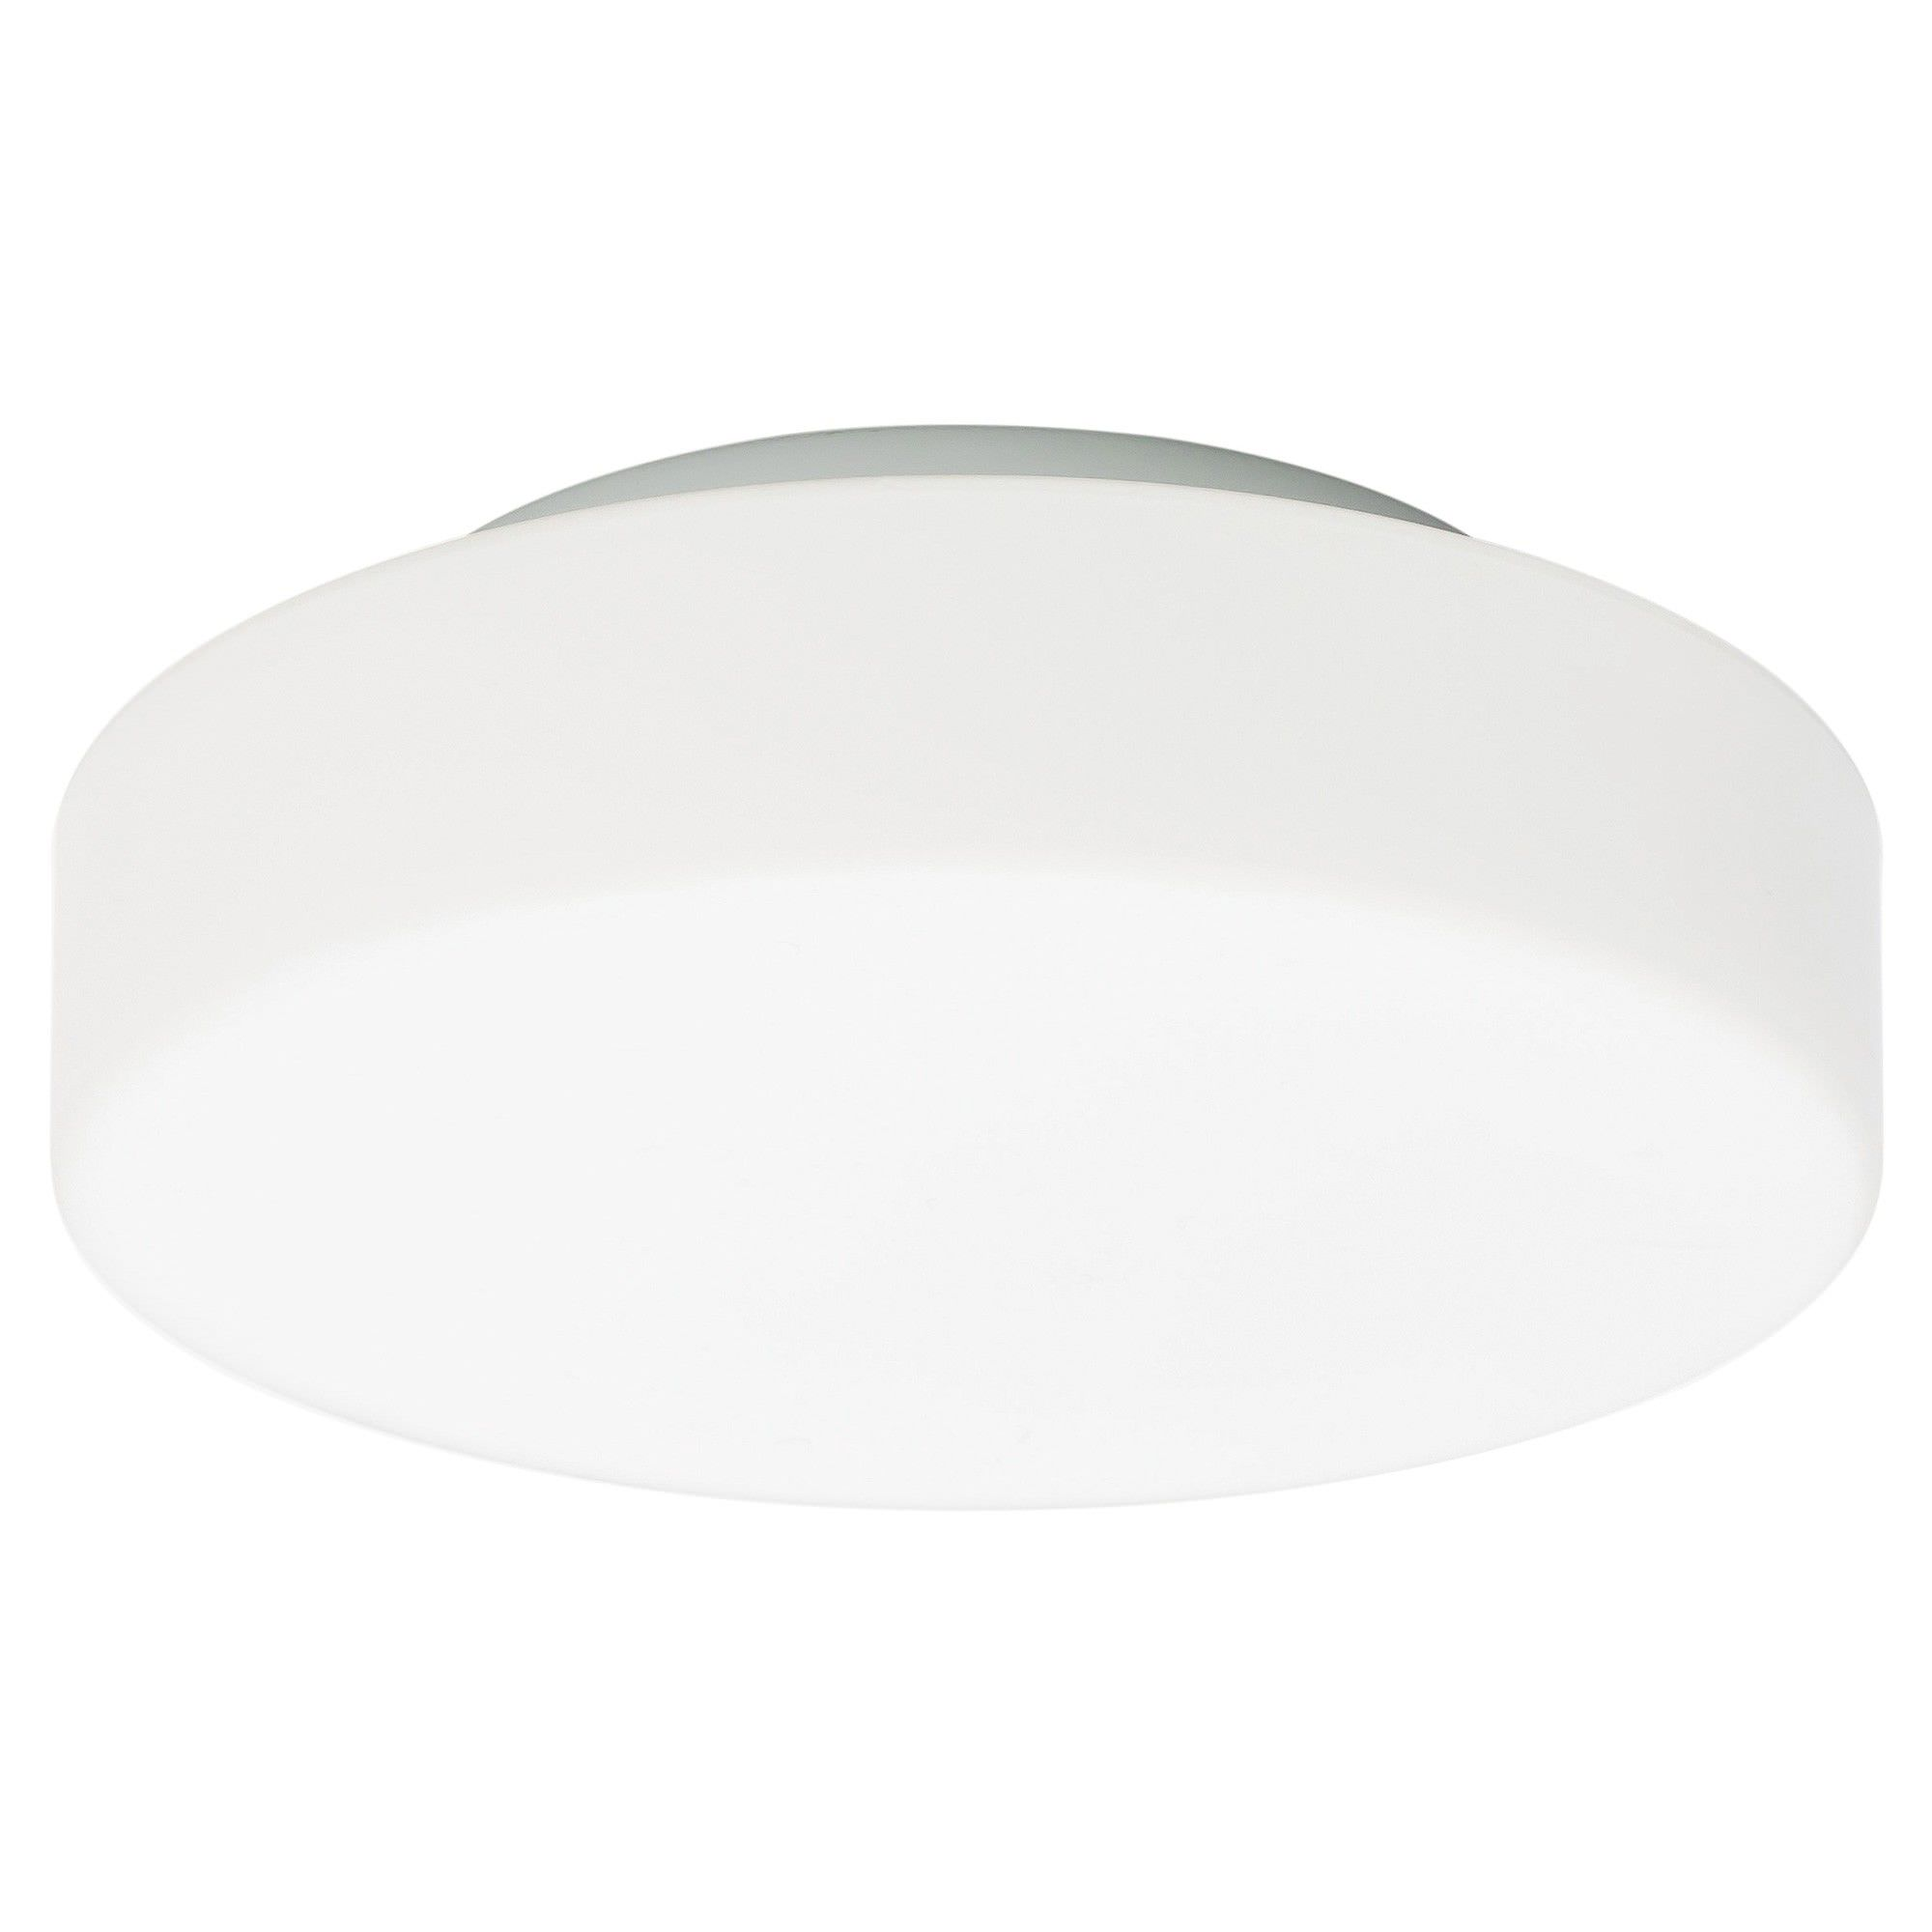 Bolero Opal Glass Oyster Ceiling Light, Medium